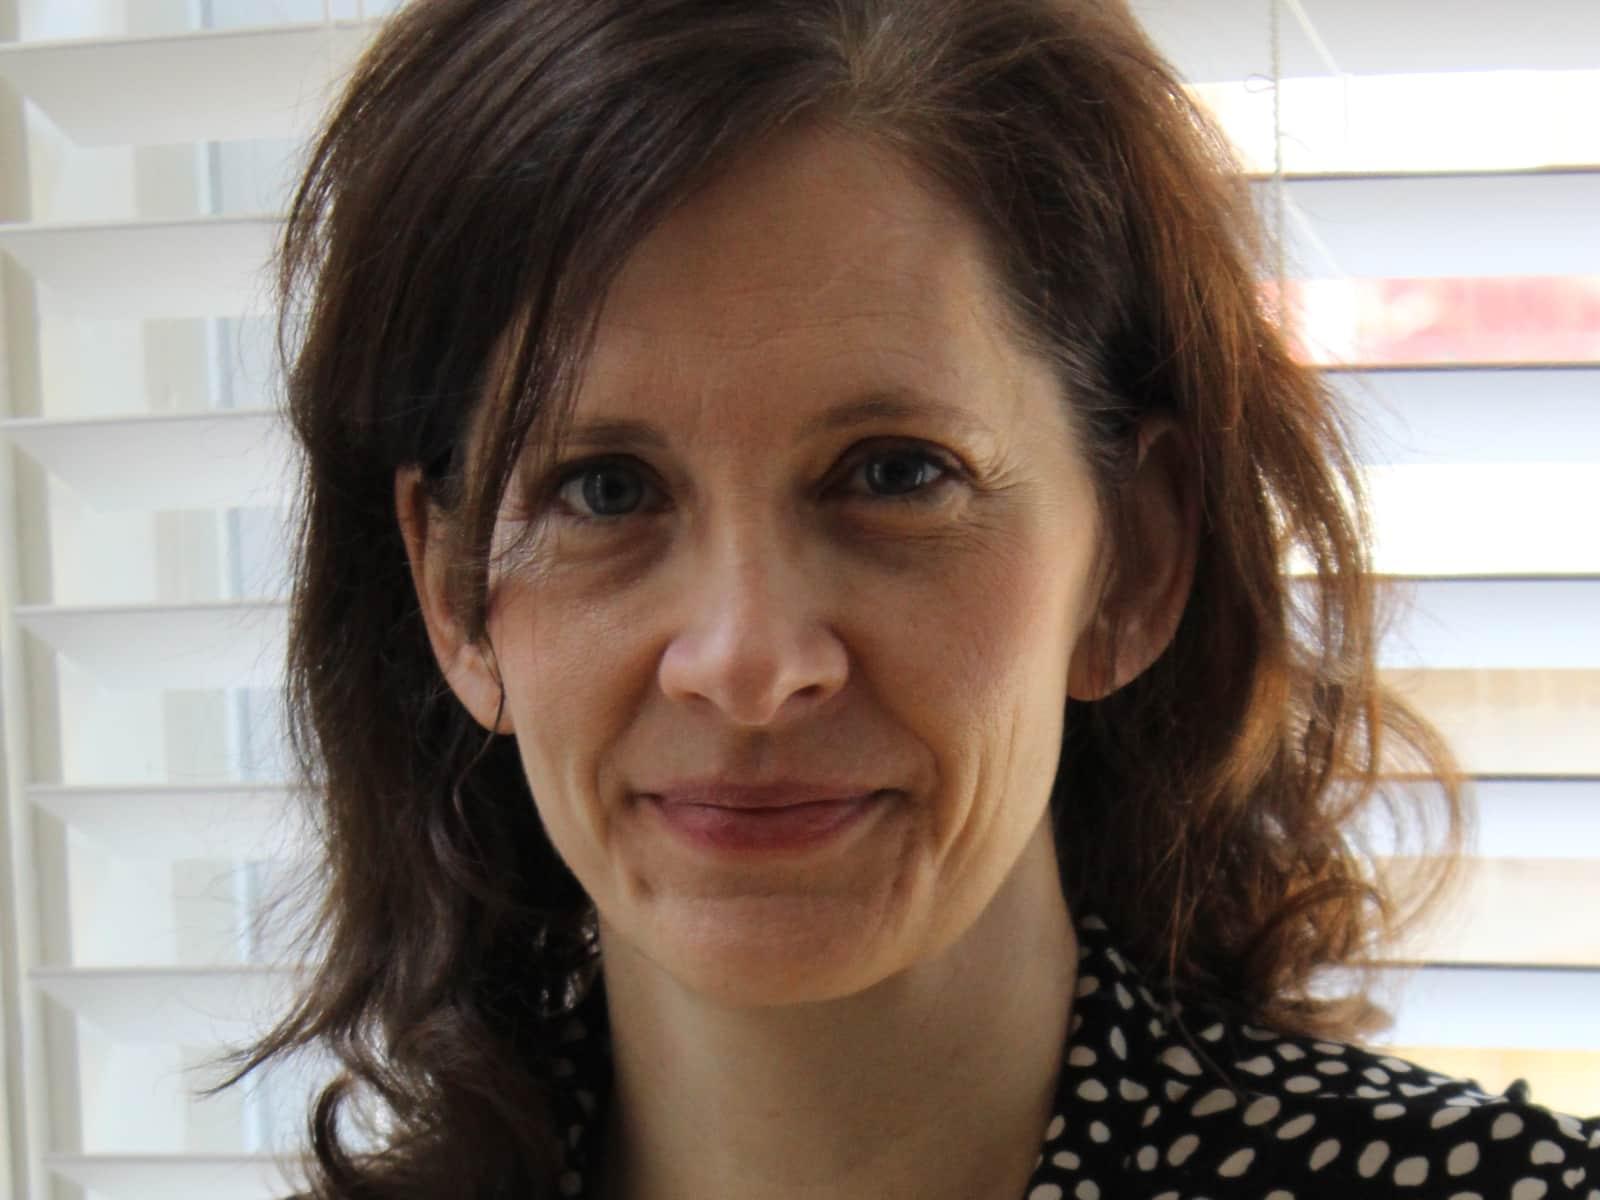 Joanne from Toronto, Ontario, Canada